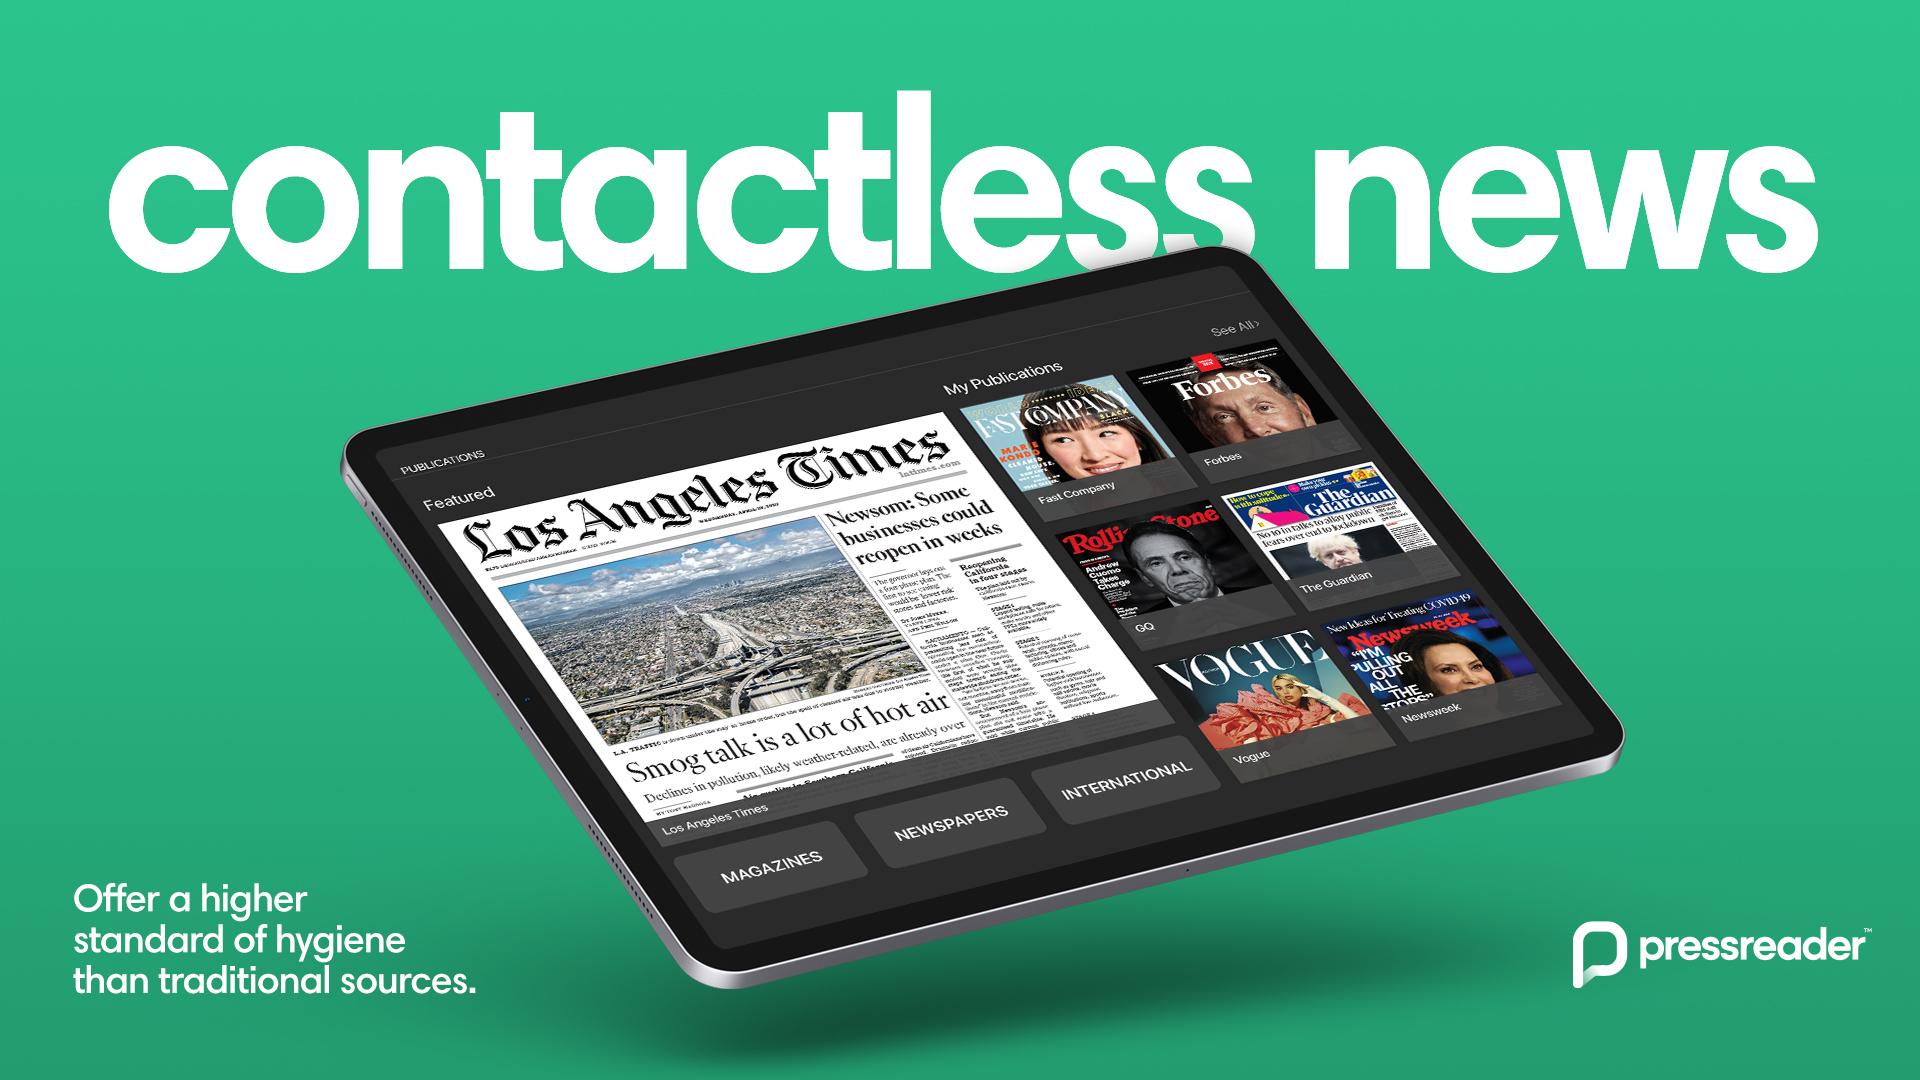 PressReader's contactless and digital platform shown on an iPad.